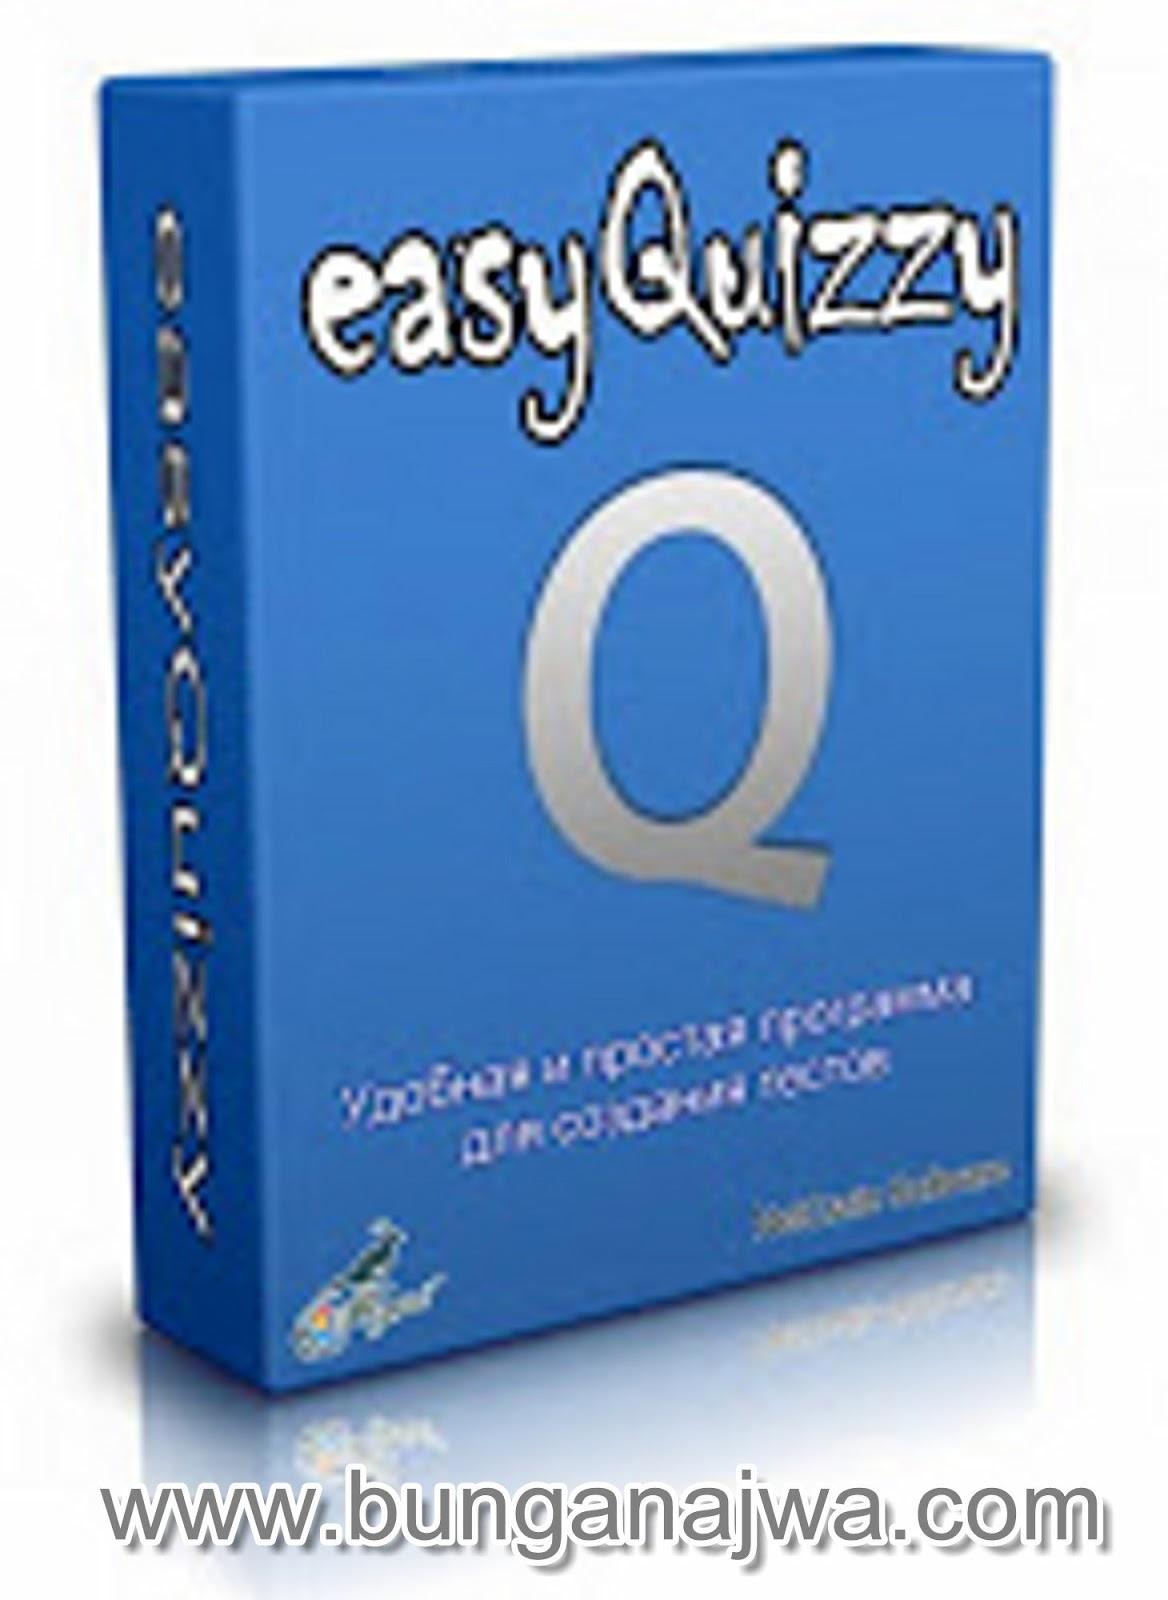 ключ для программы easyquizzy